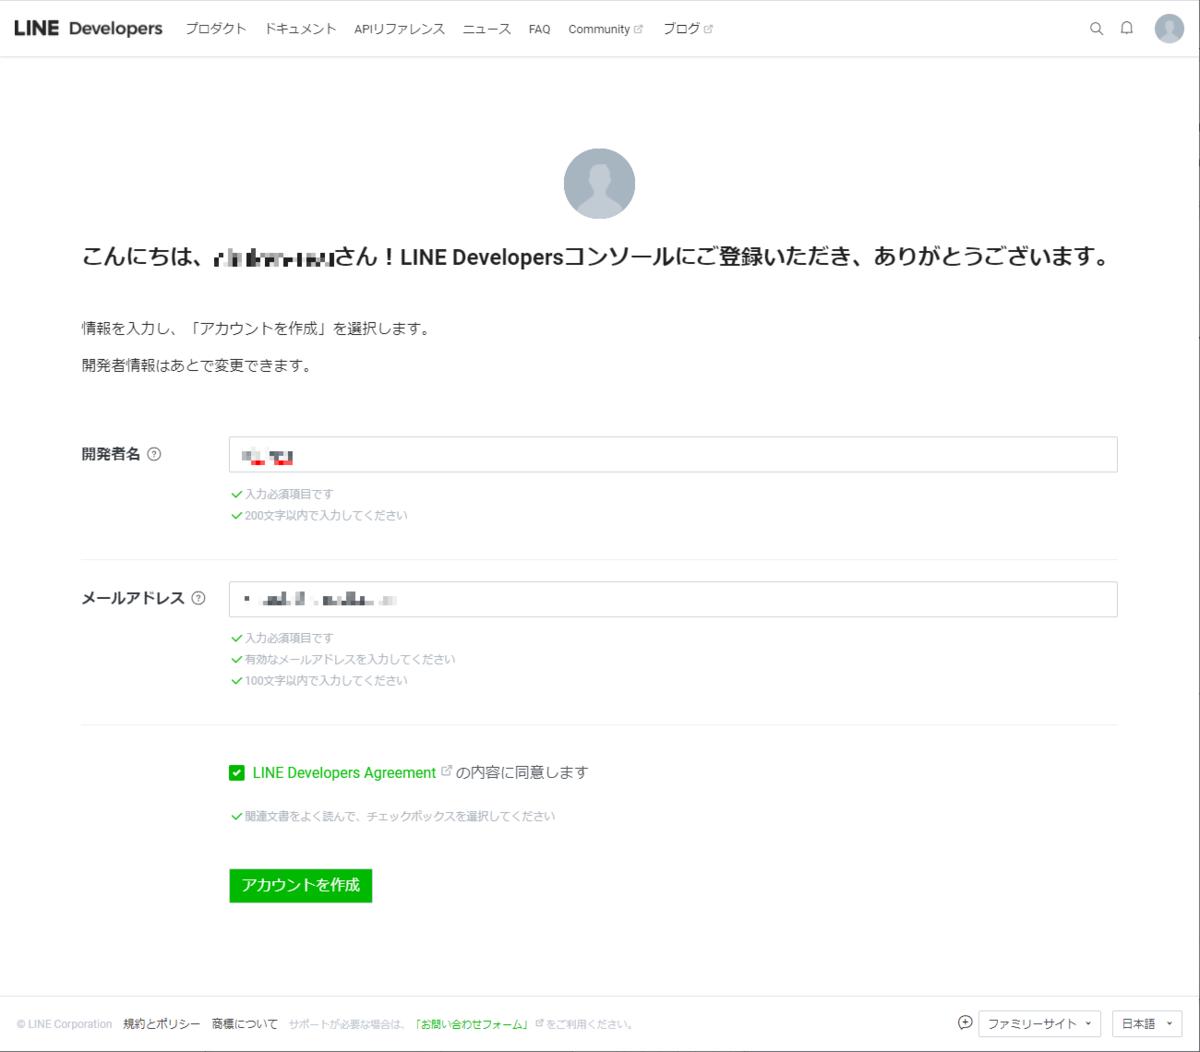 f:id:tsu--kun:20201214075657p:plain